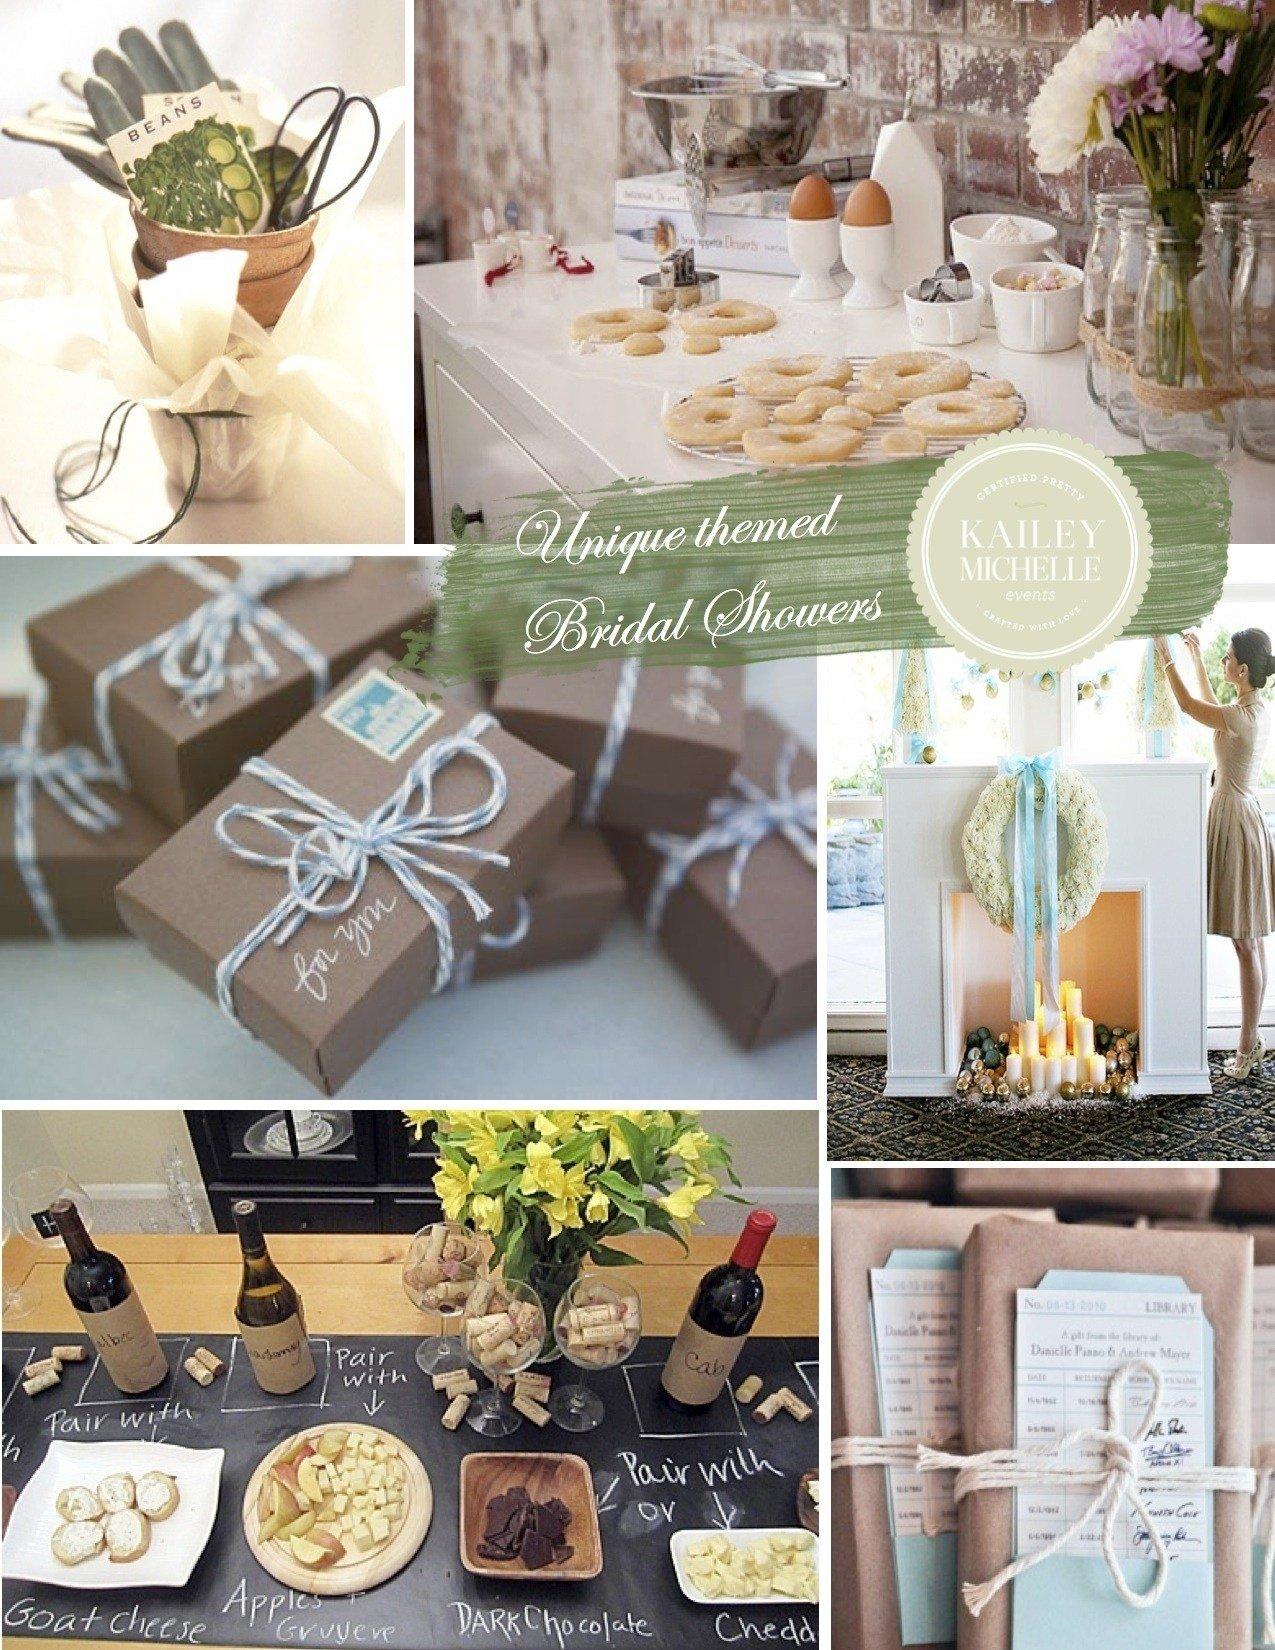 10 Ideal Bridal Shower Ideas Martha Stewart bridal shower ideas 6 unique themes 2020